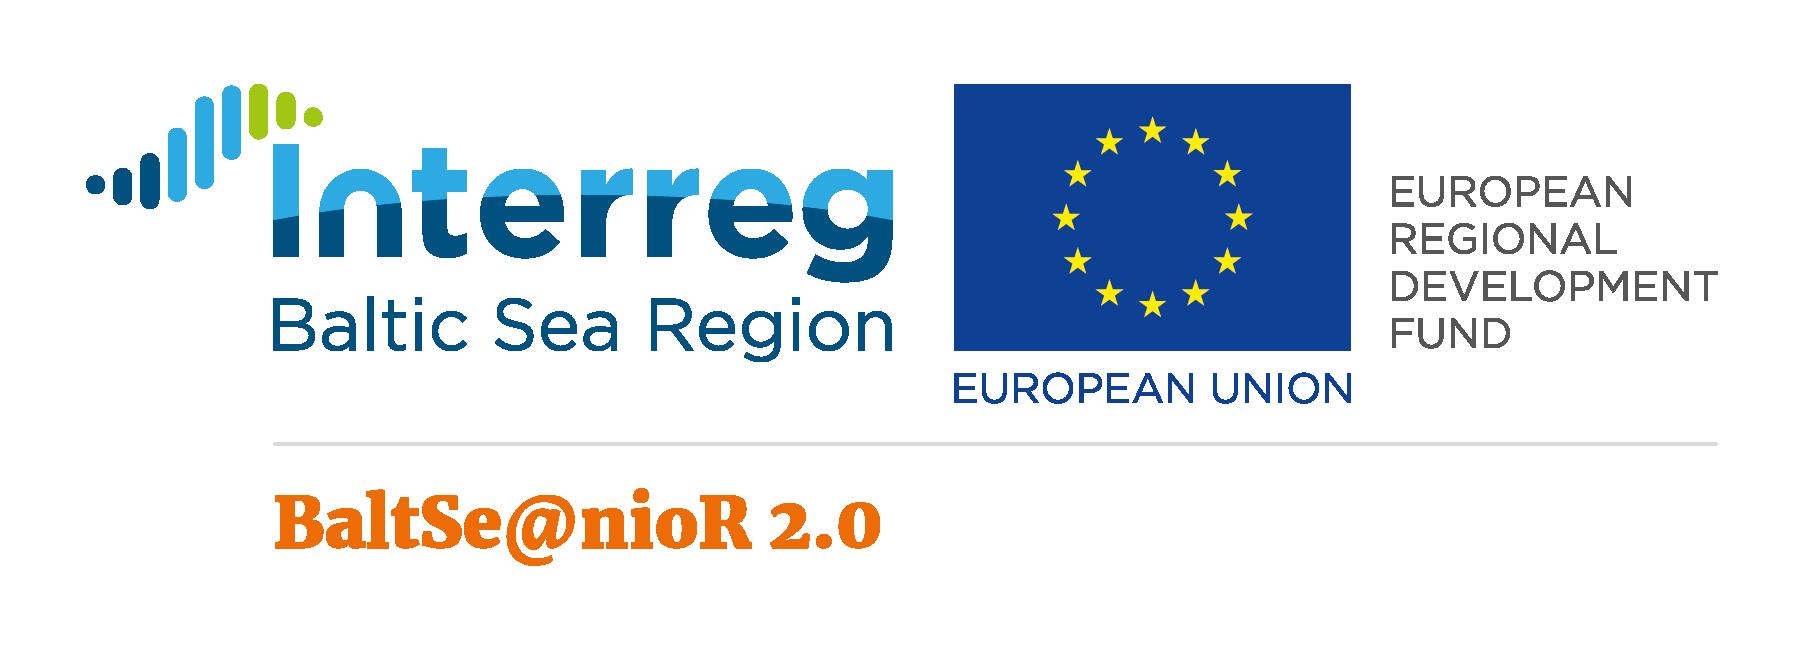 Ibsr P1 BaltSe@nioR 2.0 Project Logo Full Coloured